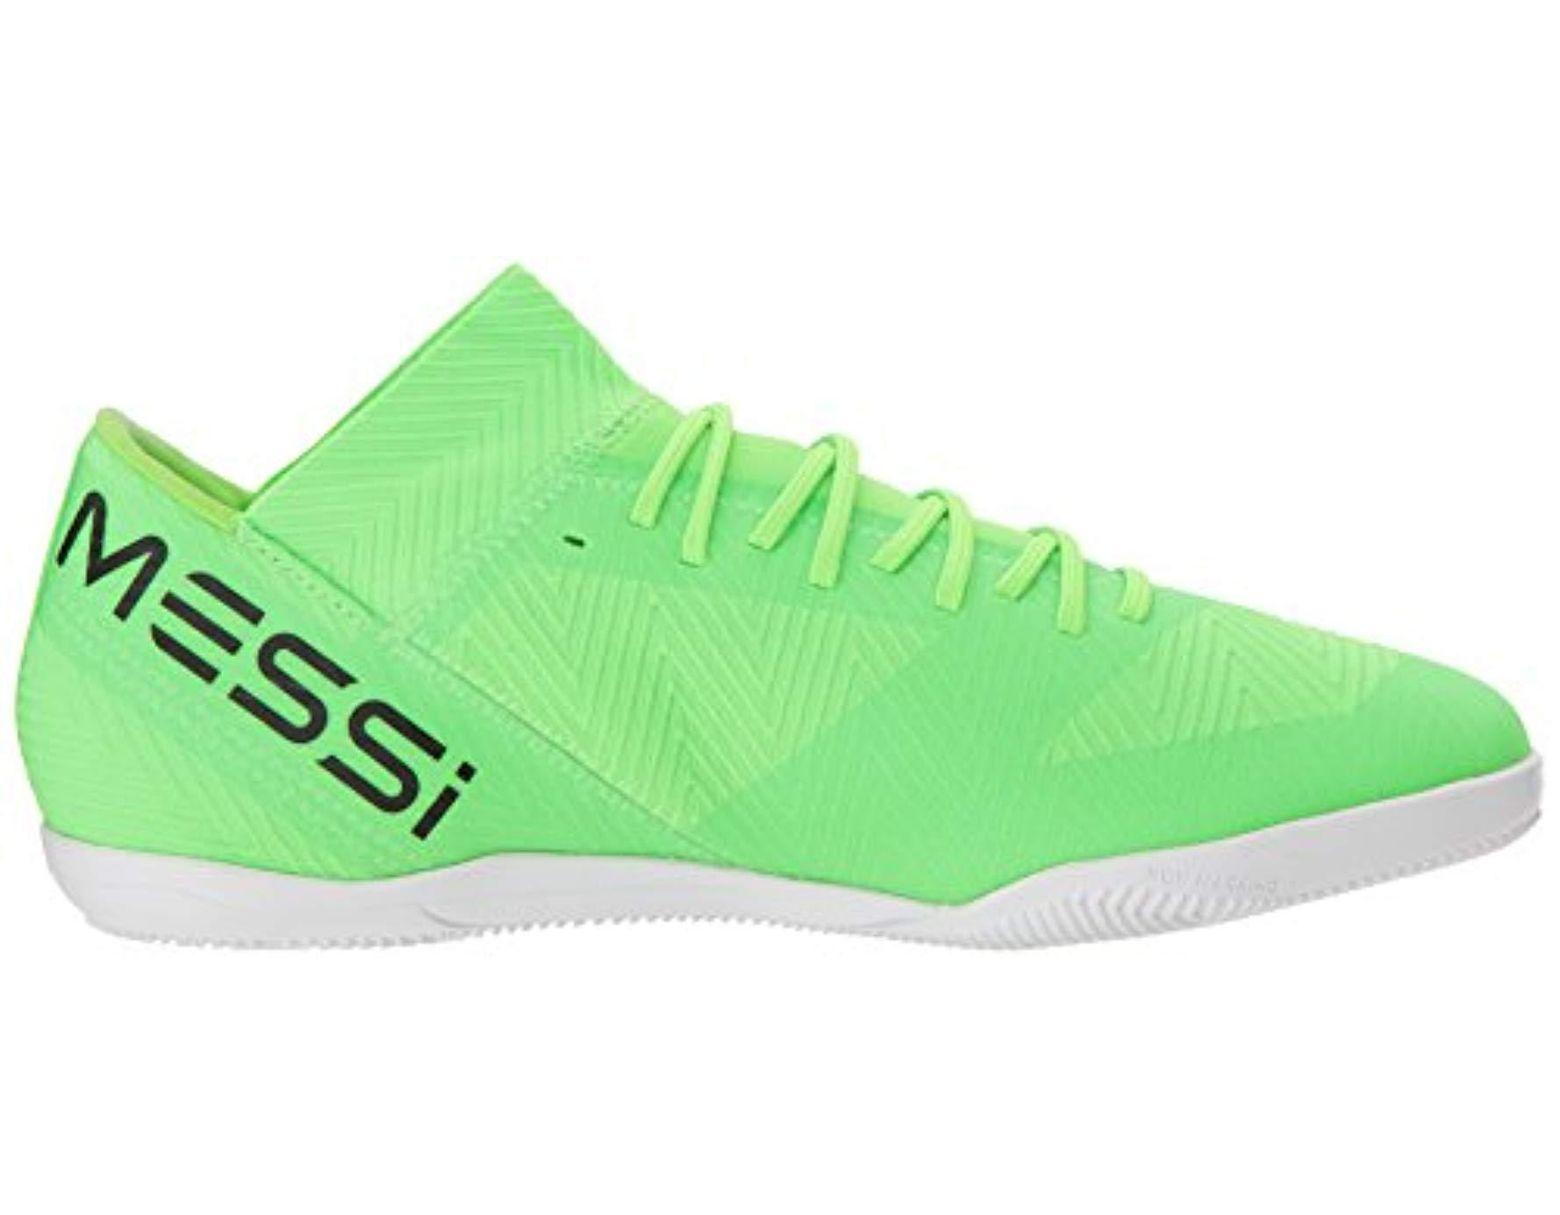 e3a0468f6 adidas Originals Nemeziz Messi Tango 18.3 Indoor Soccer Shoe in Green for  Men - Save 15% - Lyst